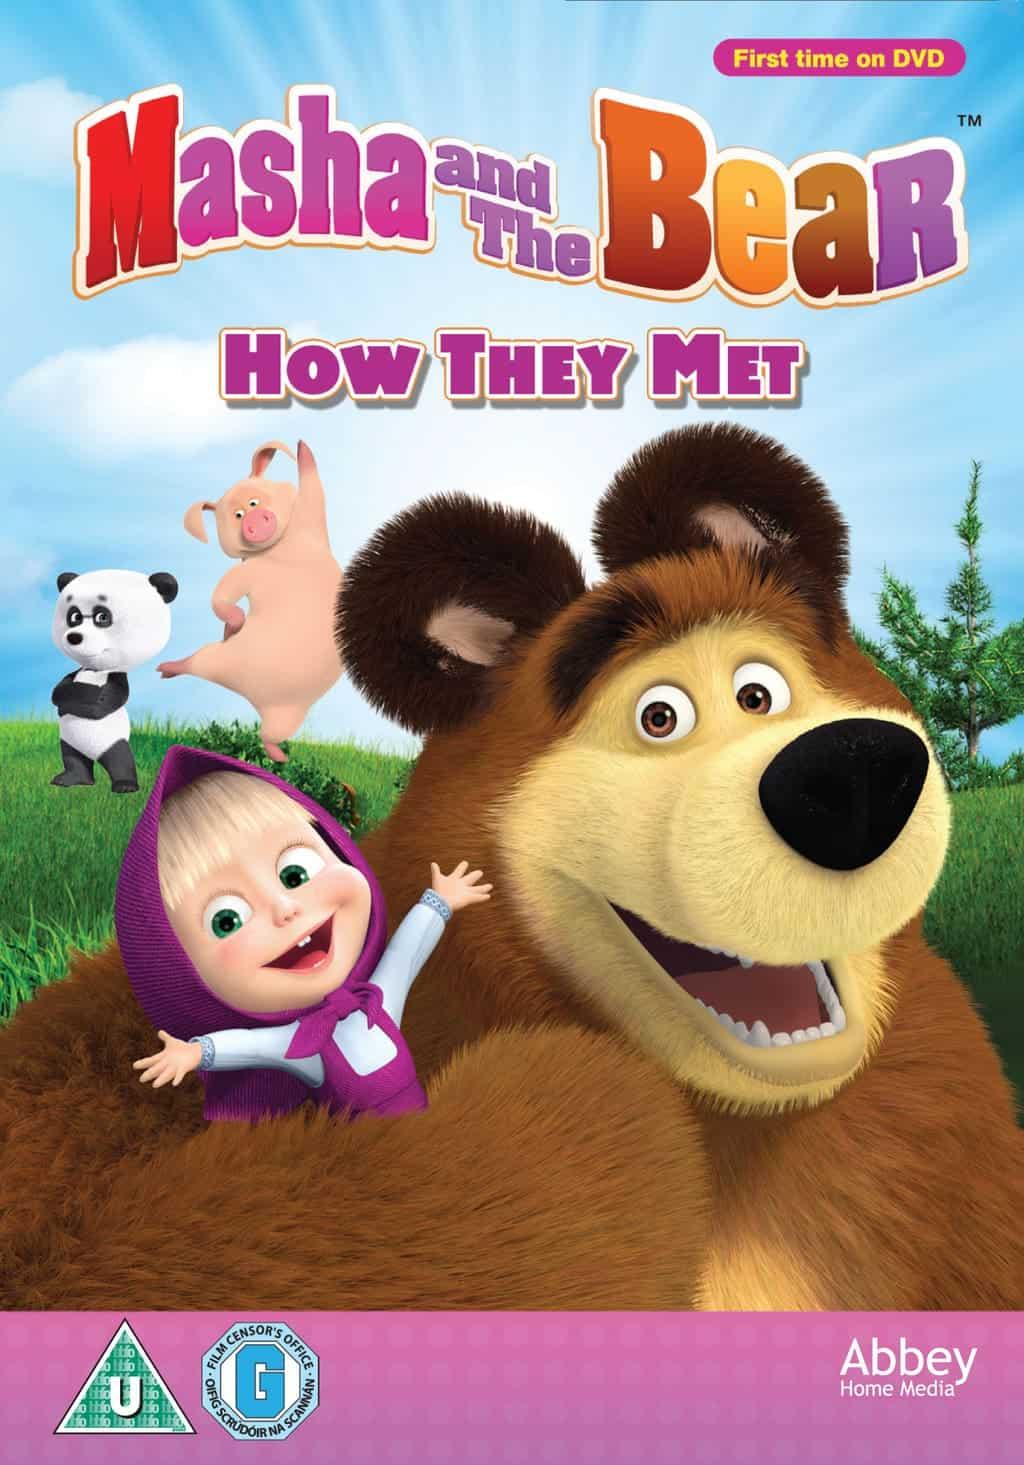 Thomas The Train Bedroom Decor Masha And The Bear How They Met Dvd